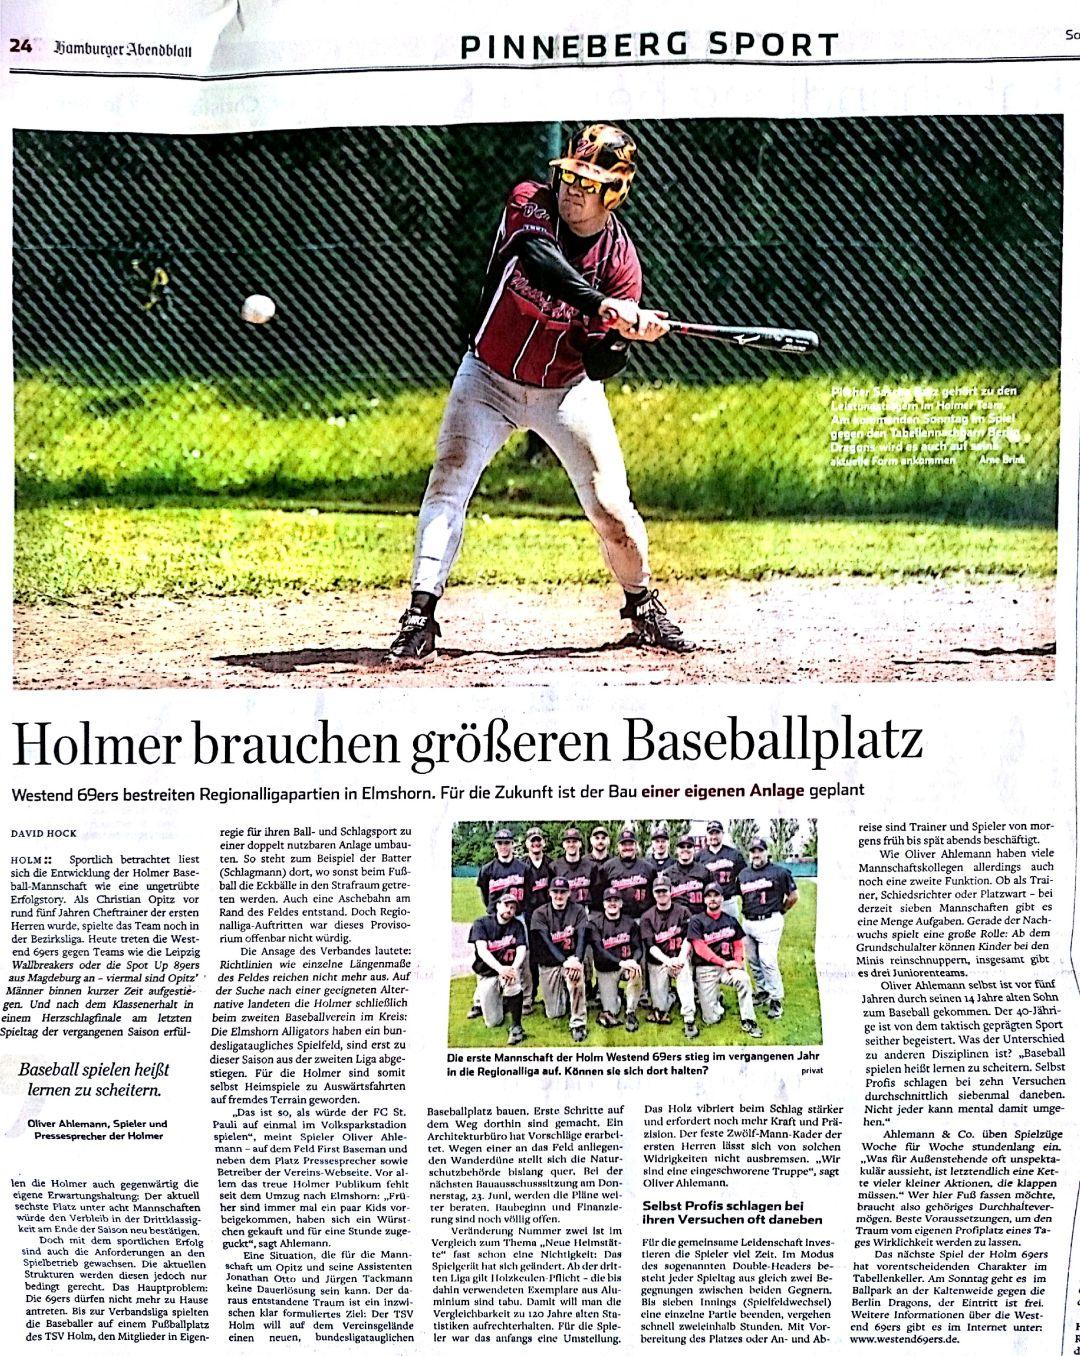 20160618_Hamburger-Abendblatt